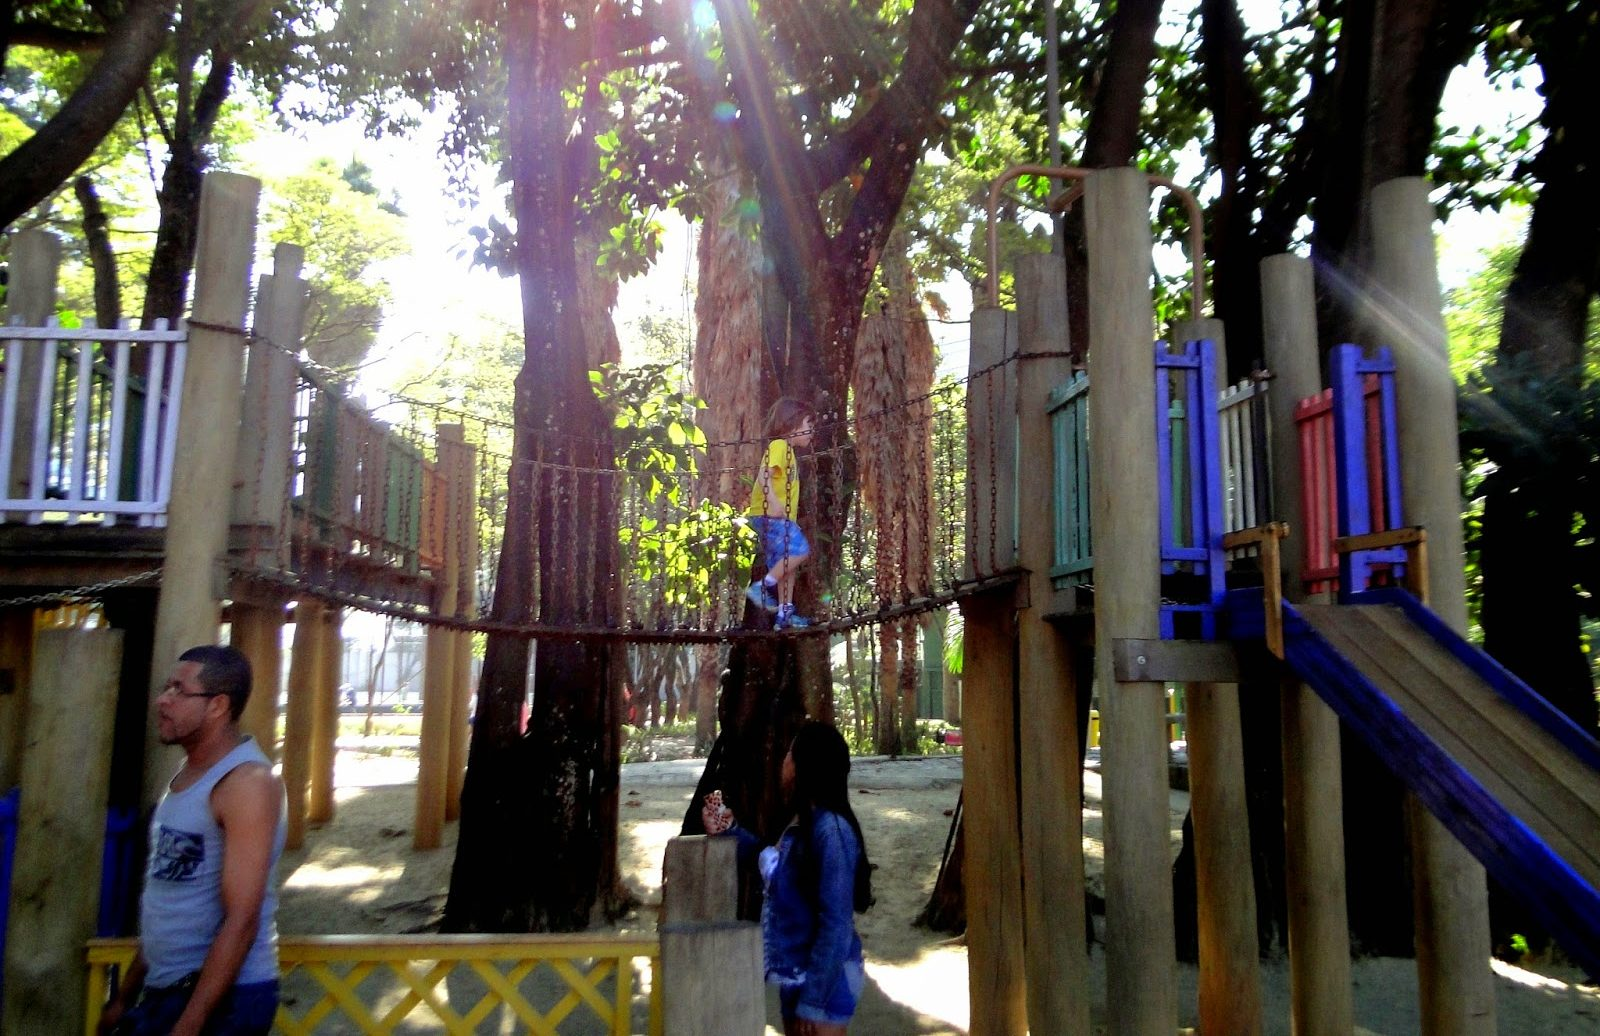 Parque Celso Daniel no Vipzinho